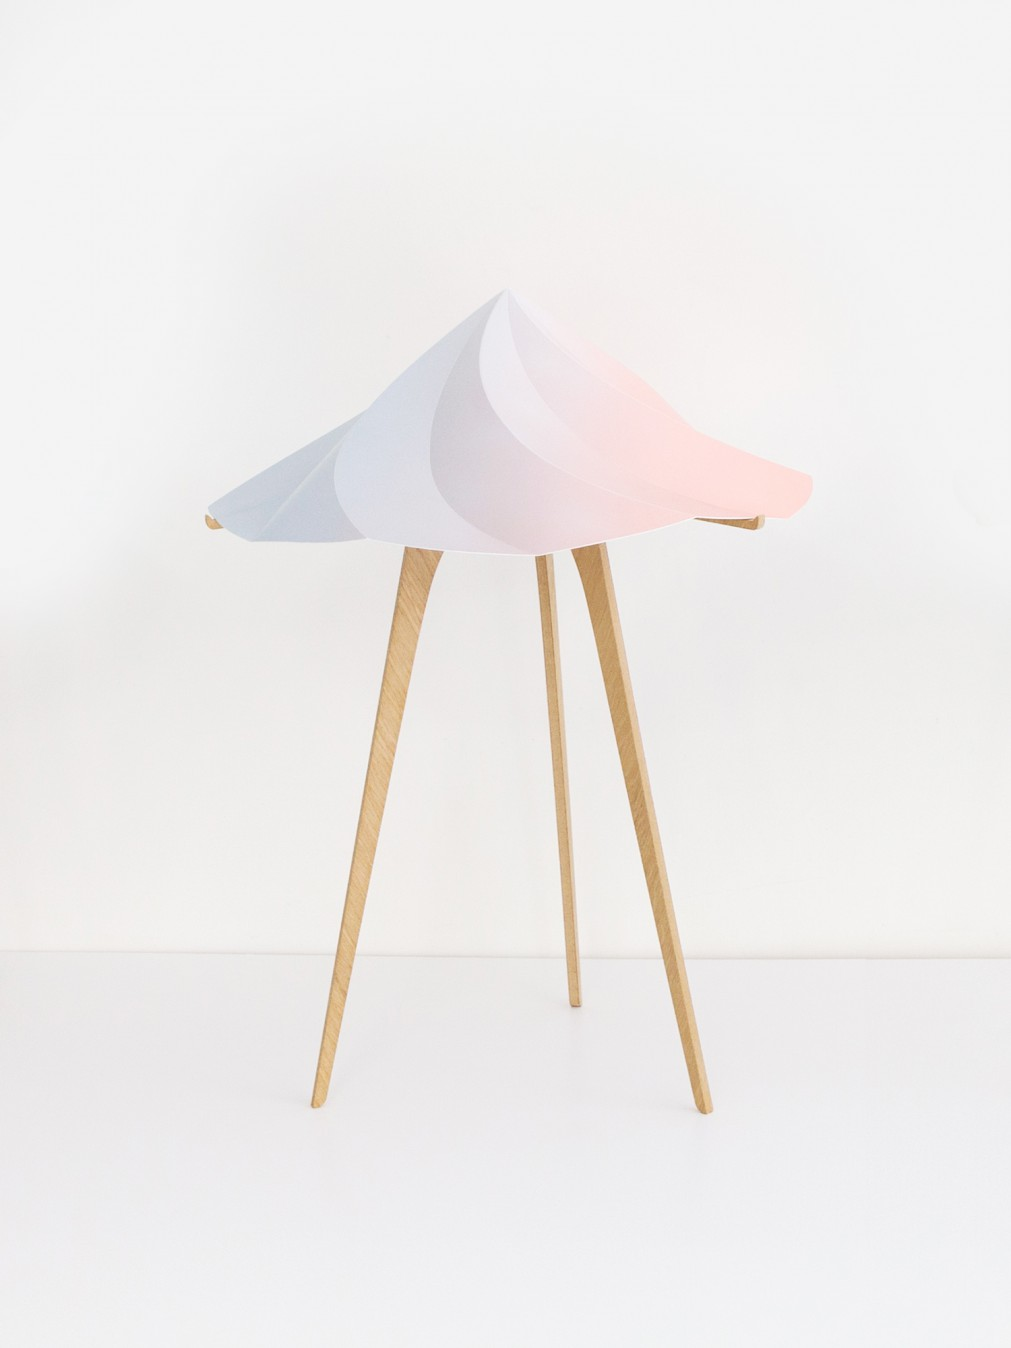 tables lamps constance guisset chantilly large table lamp moustache. Black Bedroom Furniture Sets. Home Design Ideas